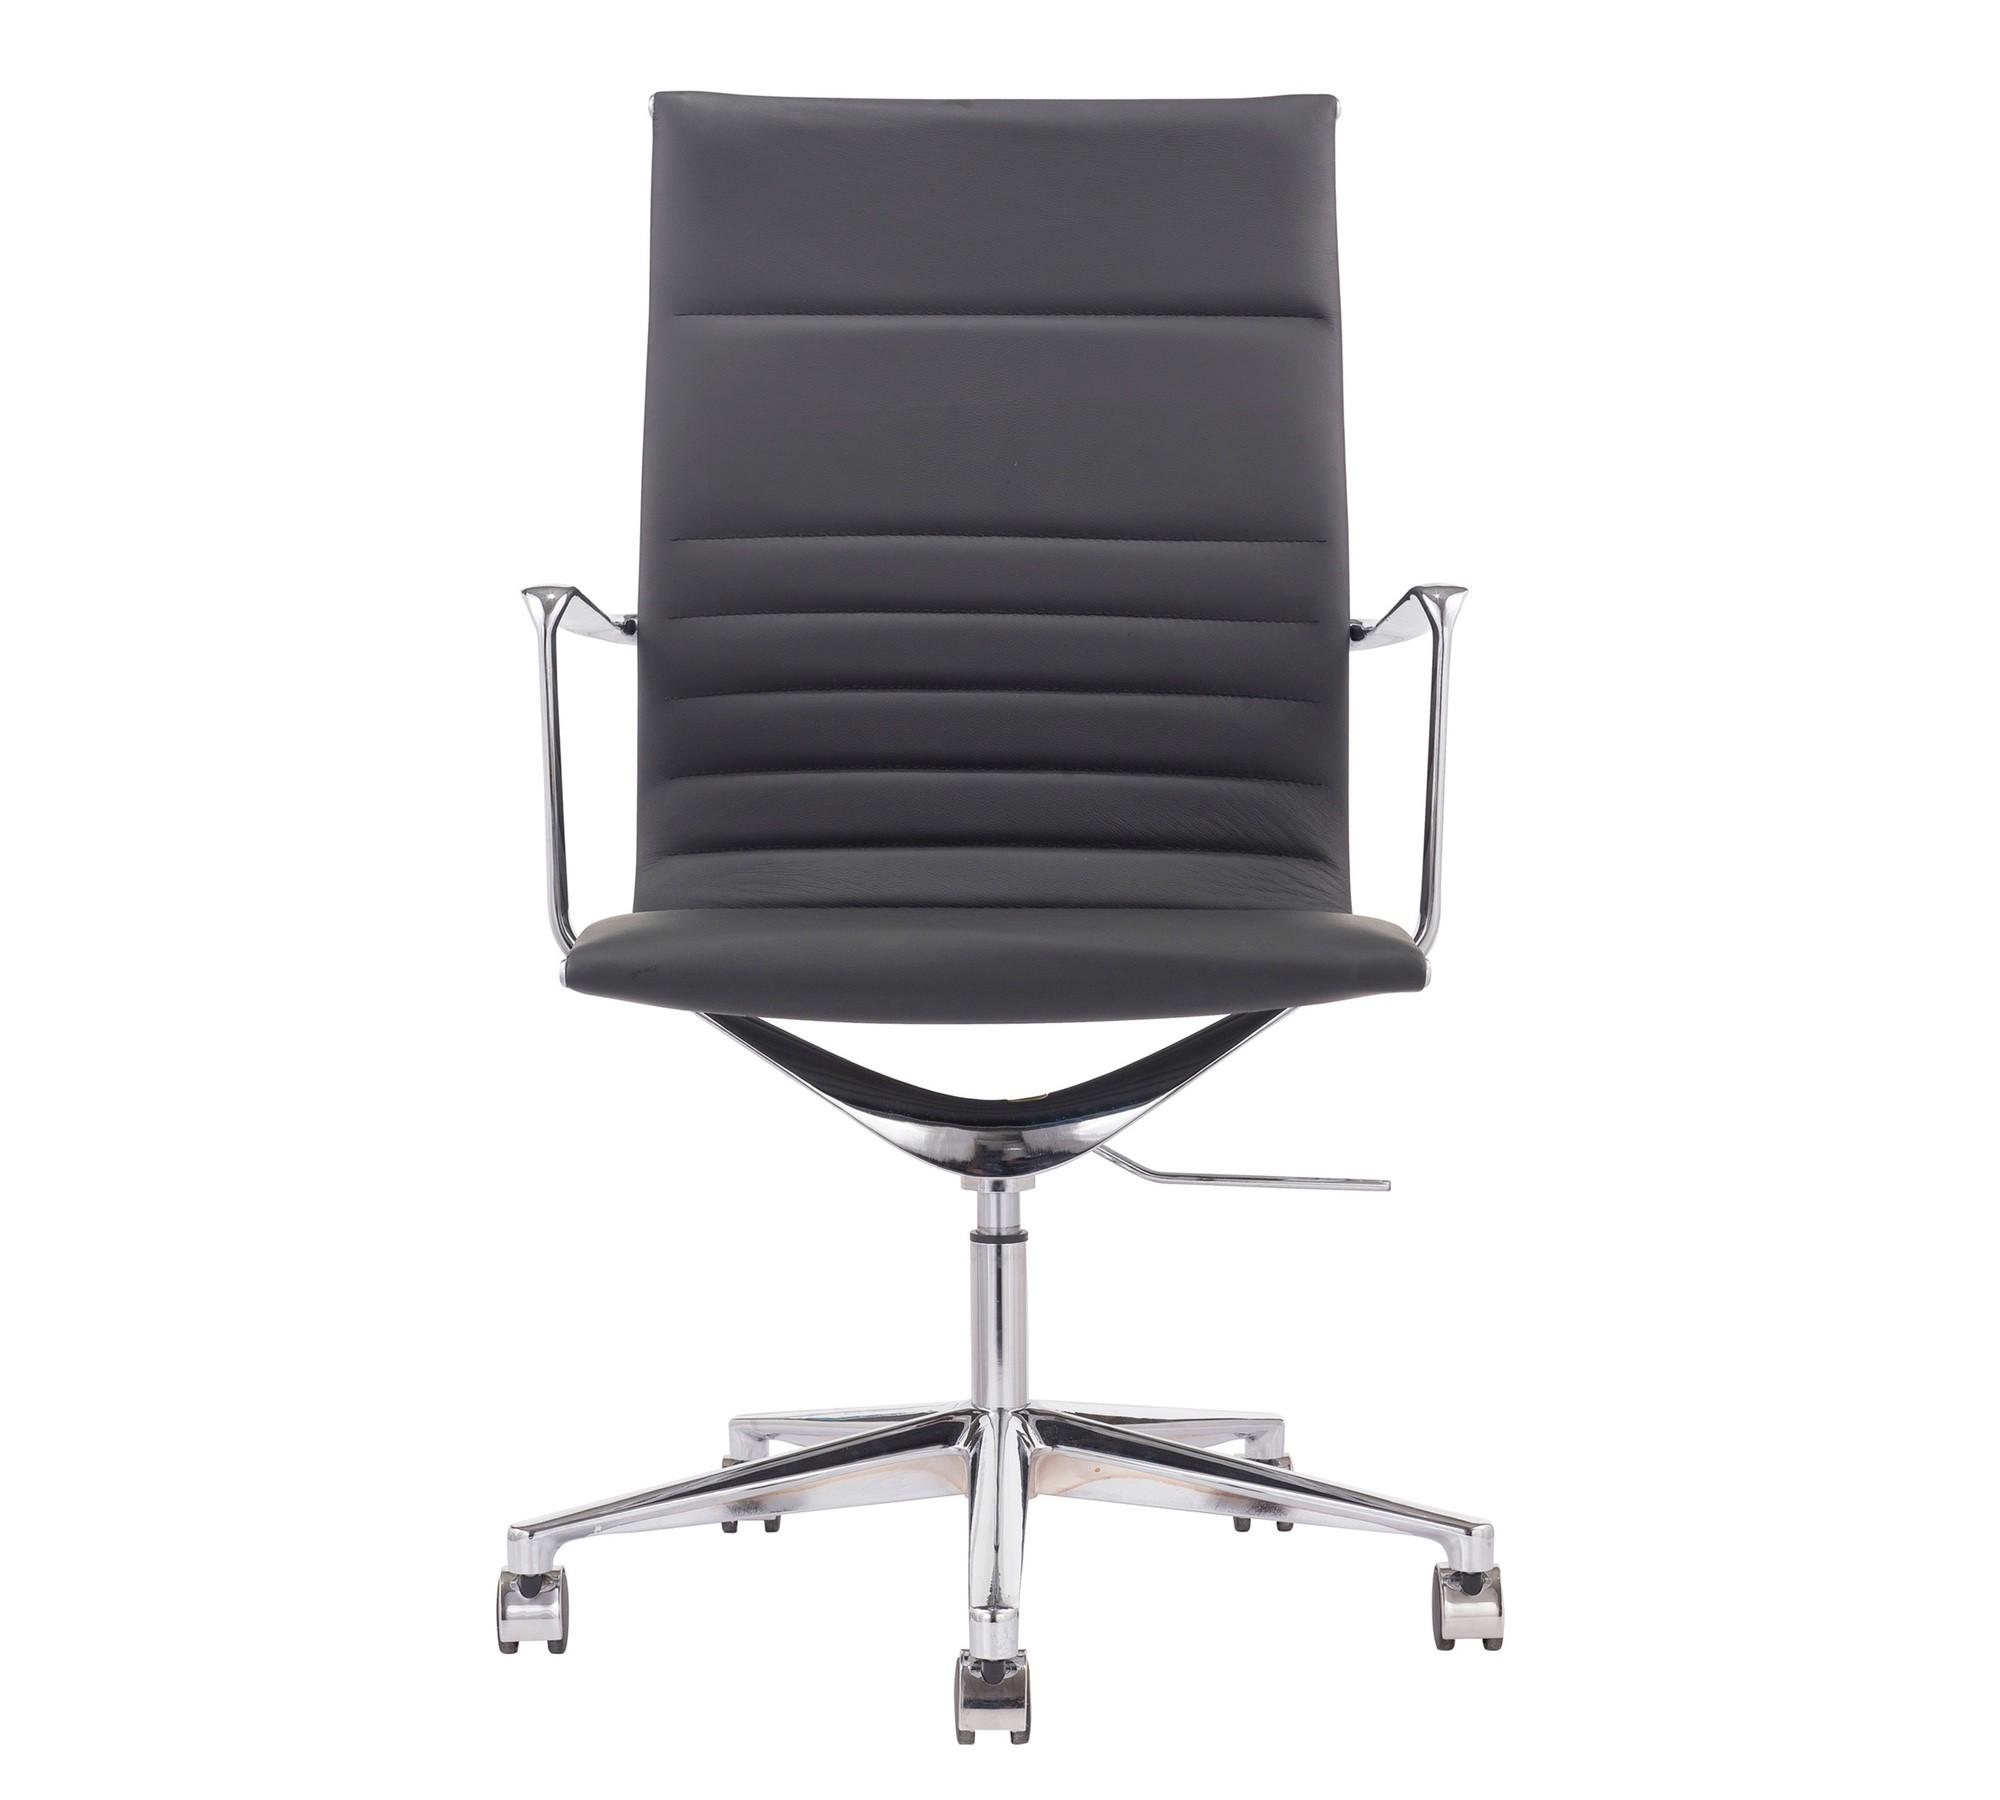 Gabler Premium Chefsessel 1030RH Echt Leder schwarz